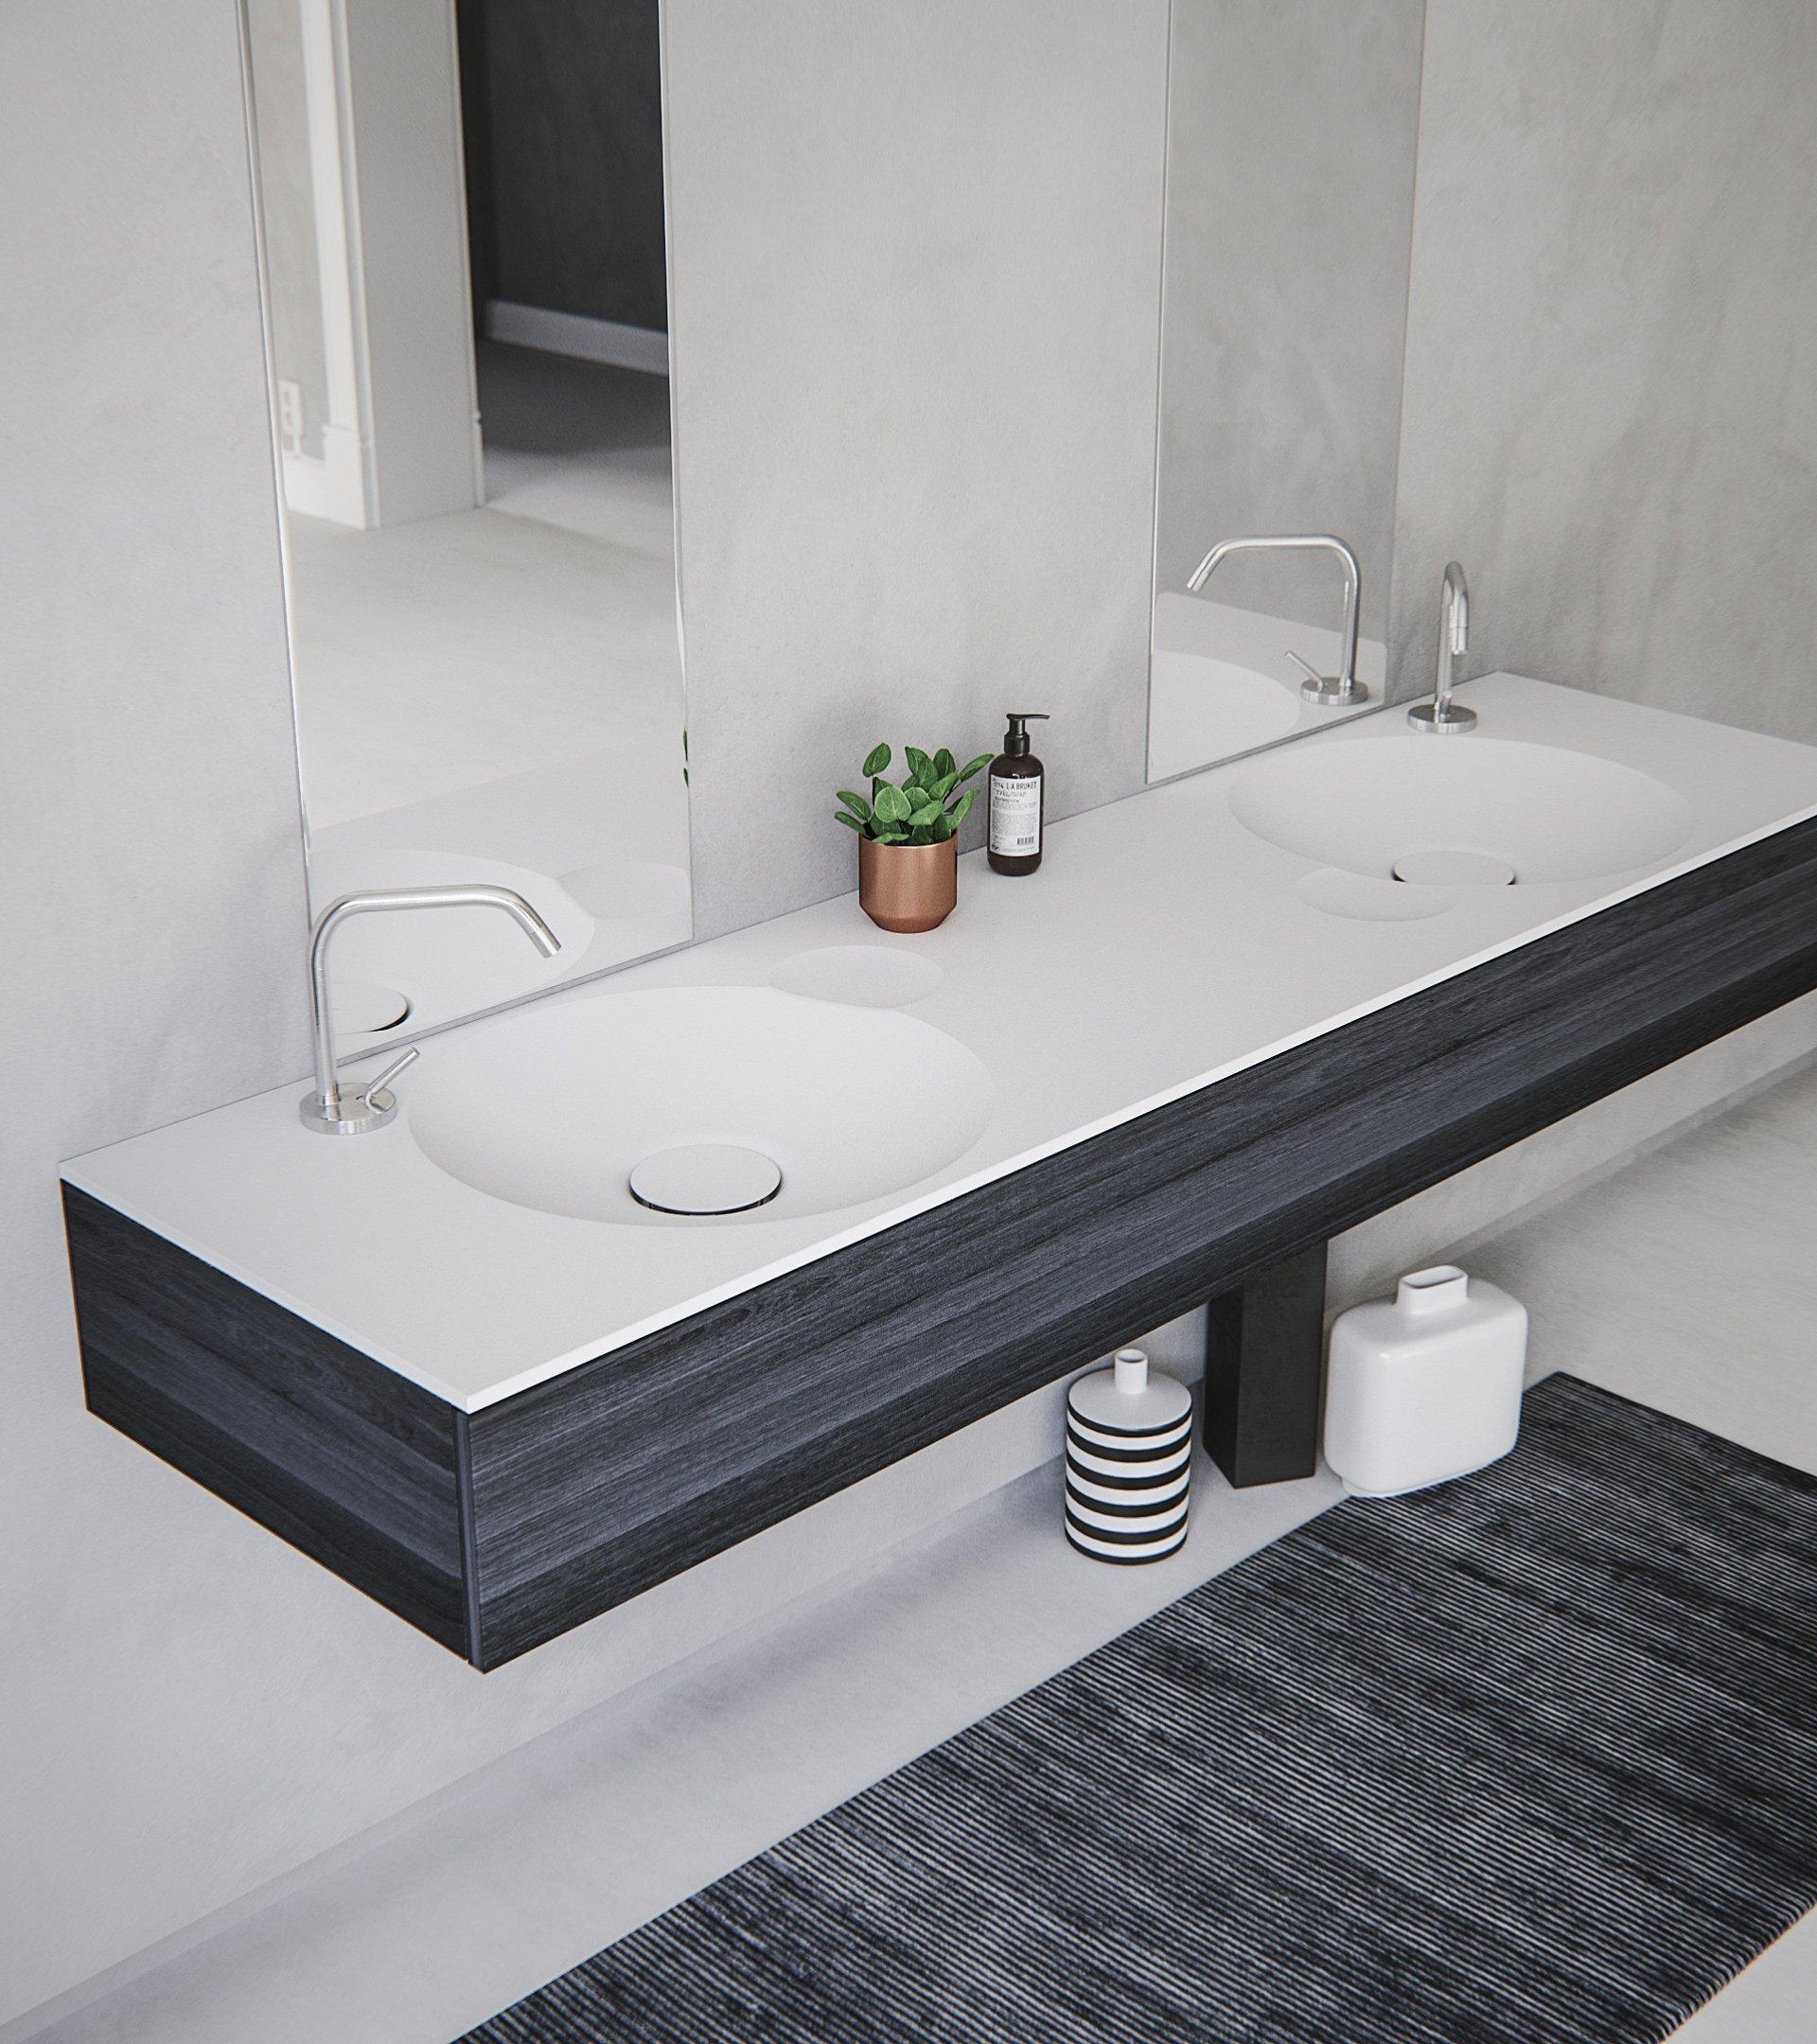 Erosion 02 Dual Contemporary Bathroom Sinks Minimalist Bathroom